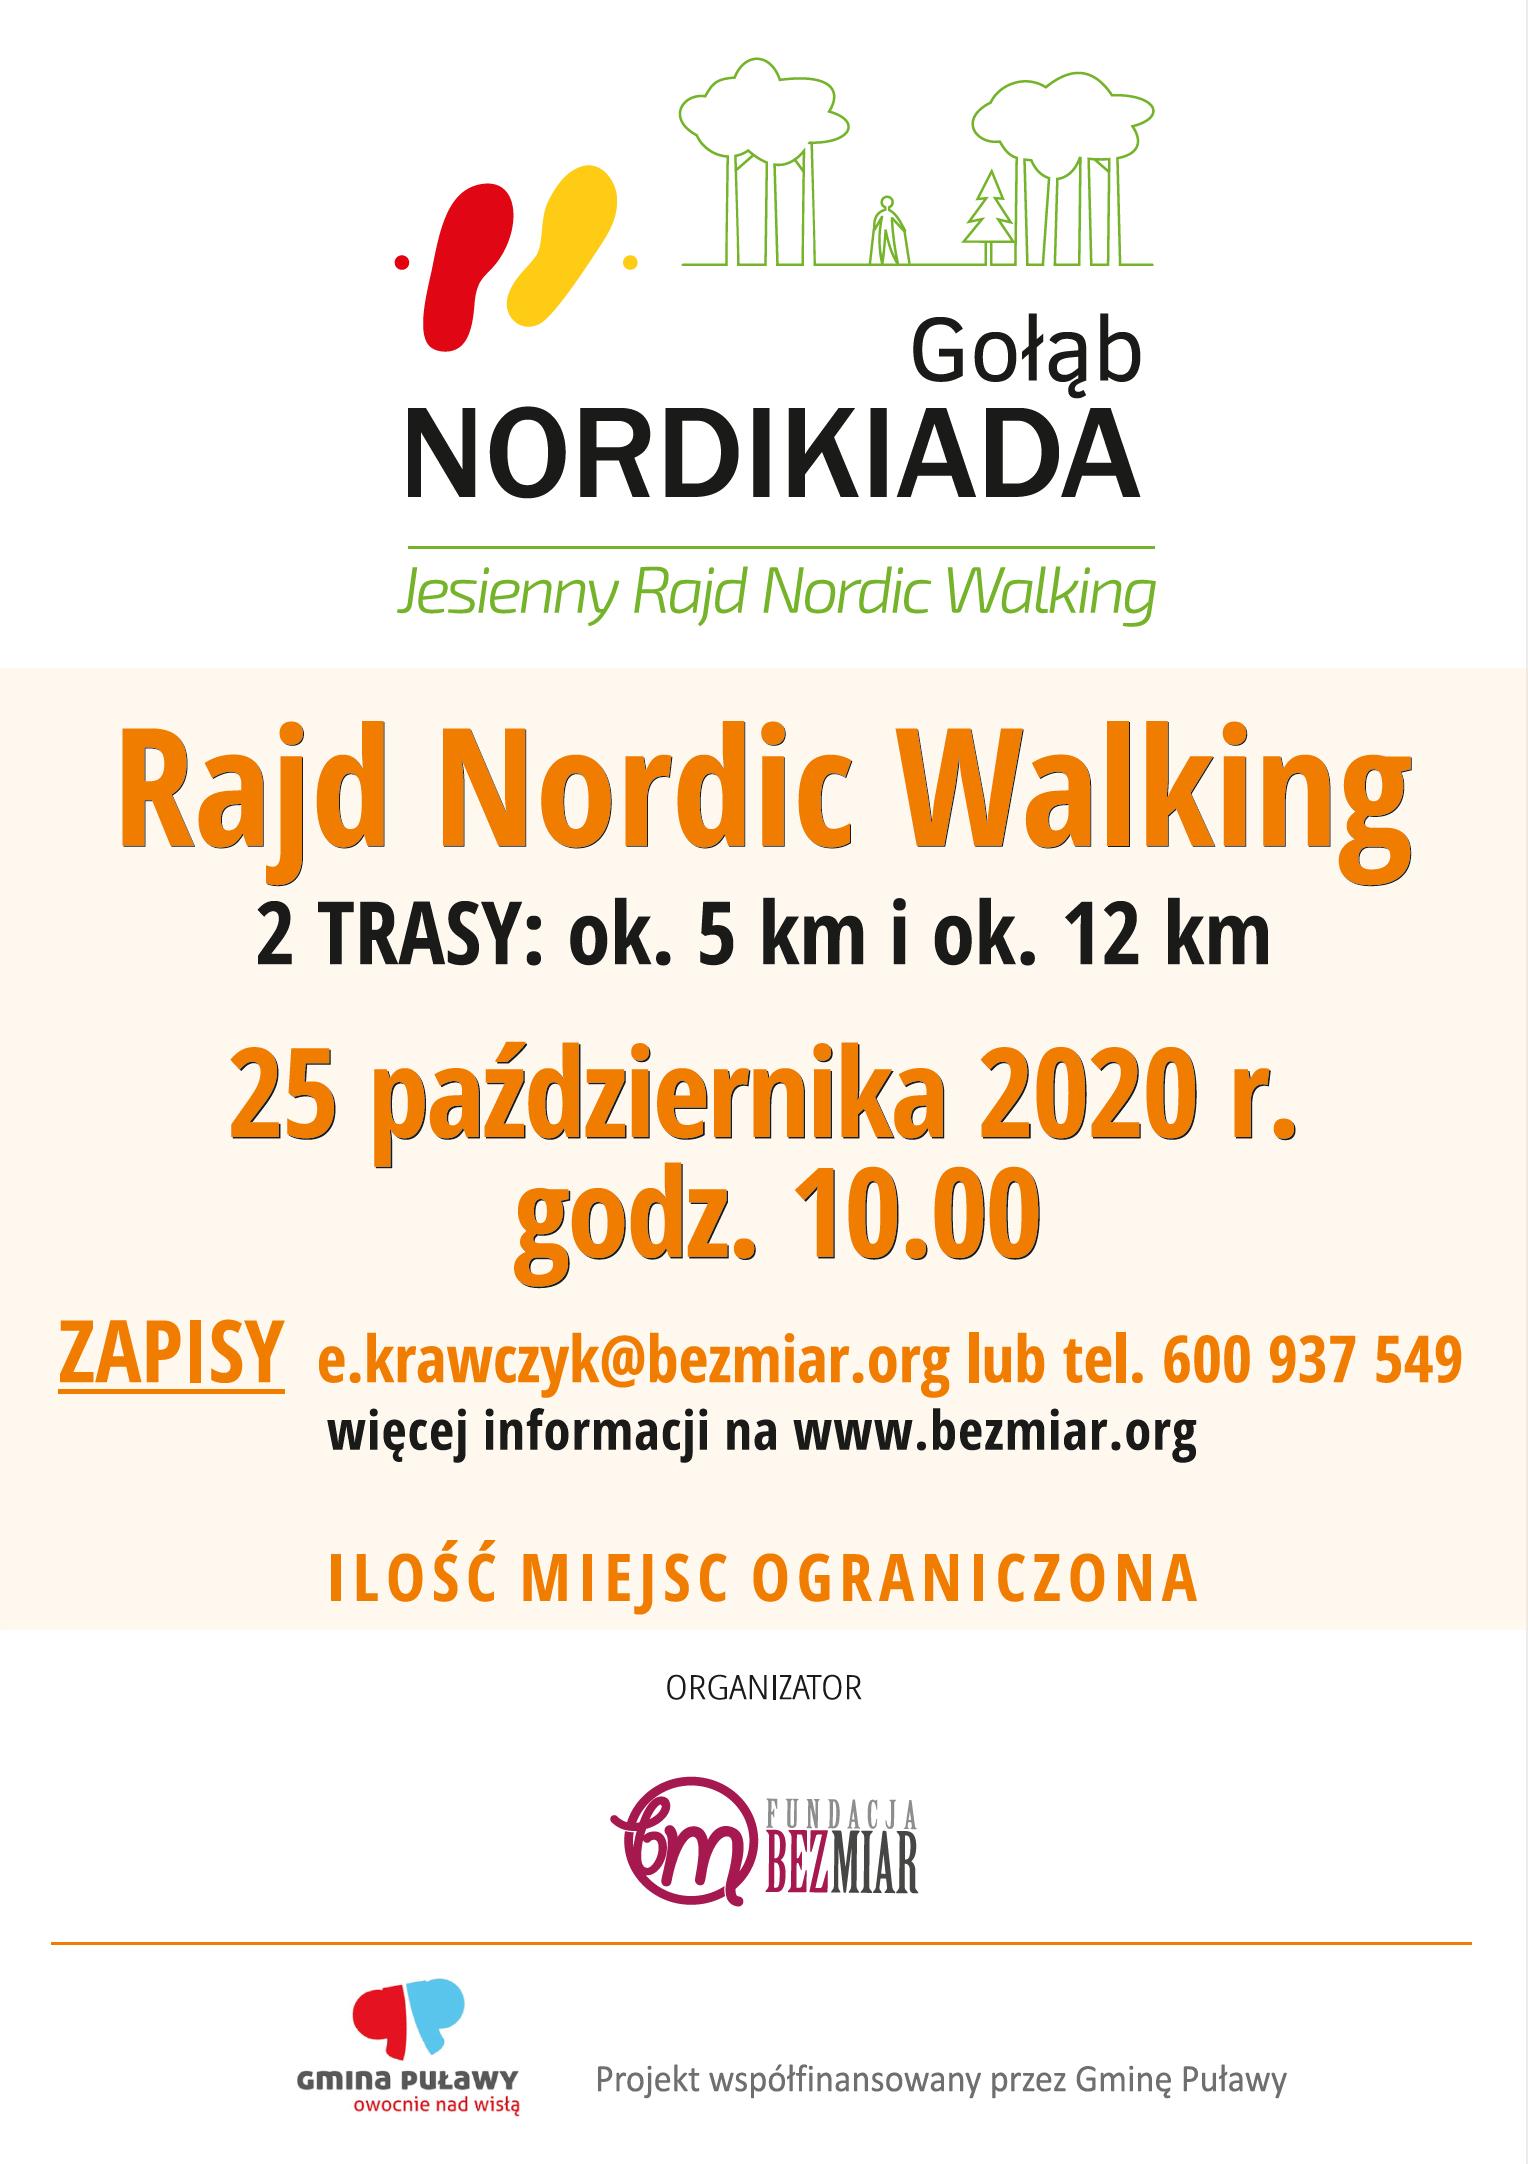 Jesienny Rajd Nordic Walking - Gołąb 2020